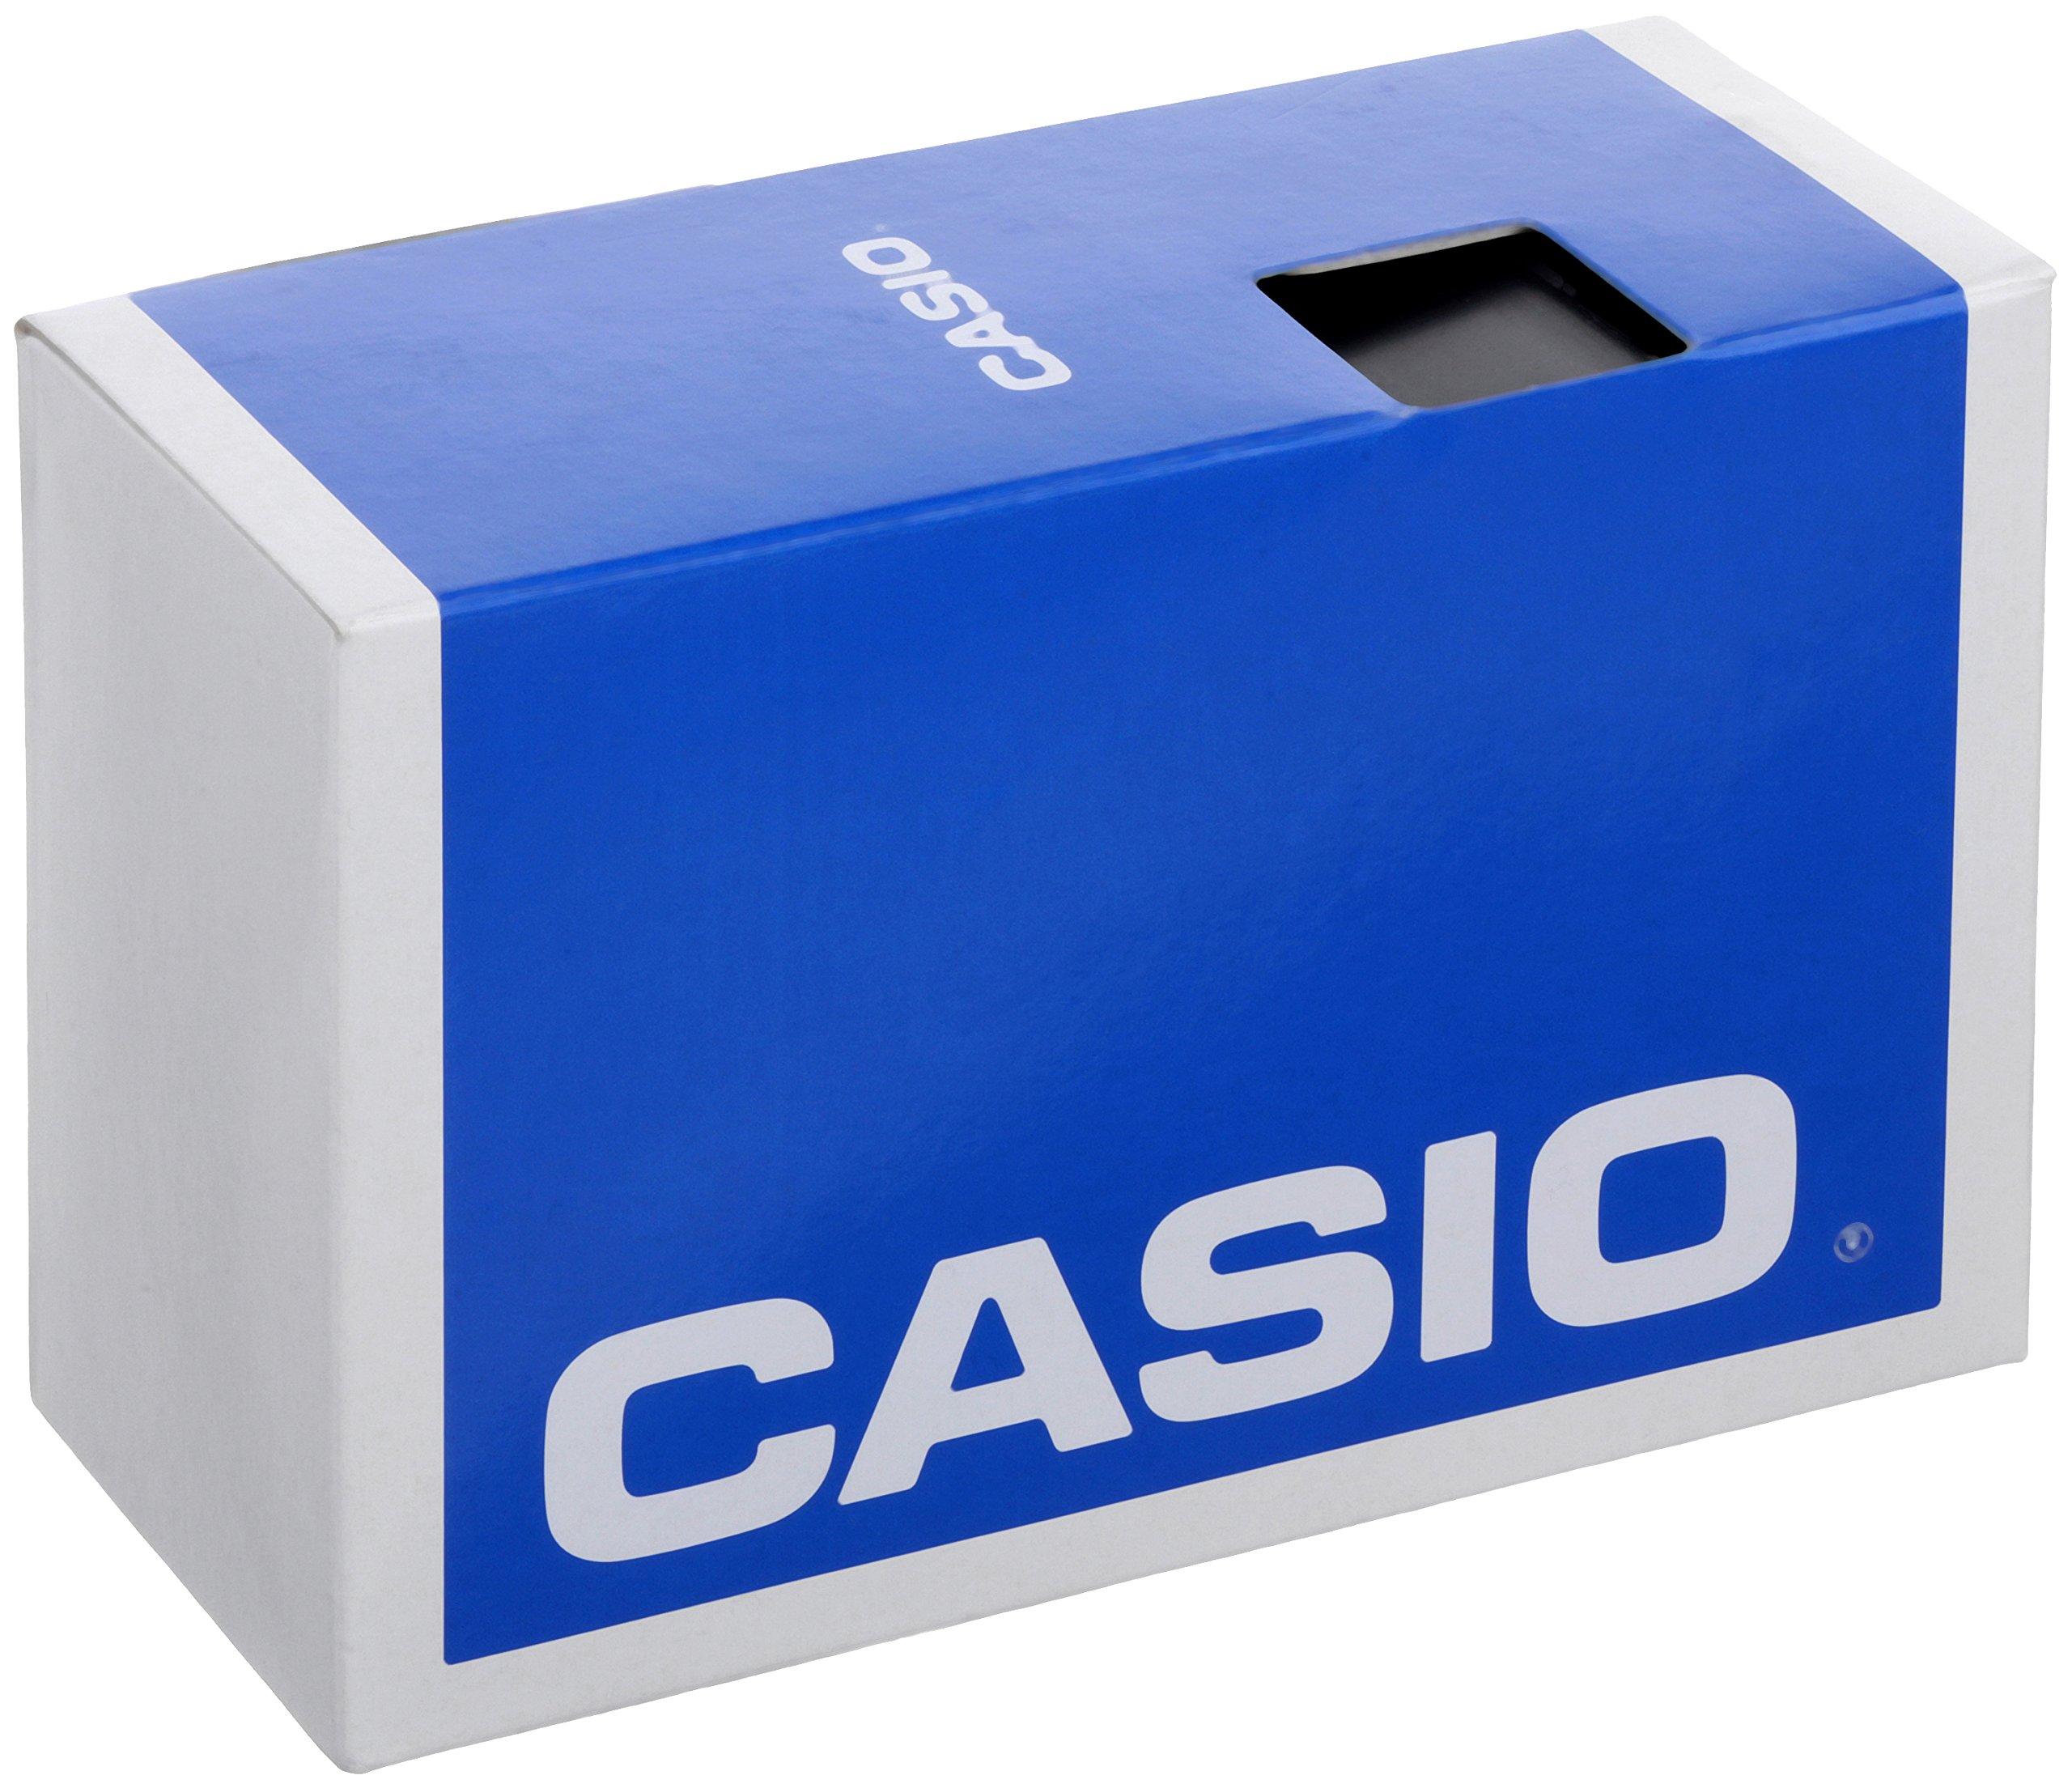 Casio Women's Classic Quartz Watch with Resin Strap, Grey, 15.8 (Model: LA-20WH-8ACF